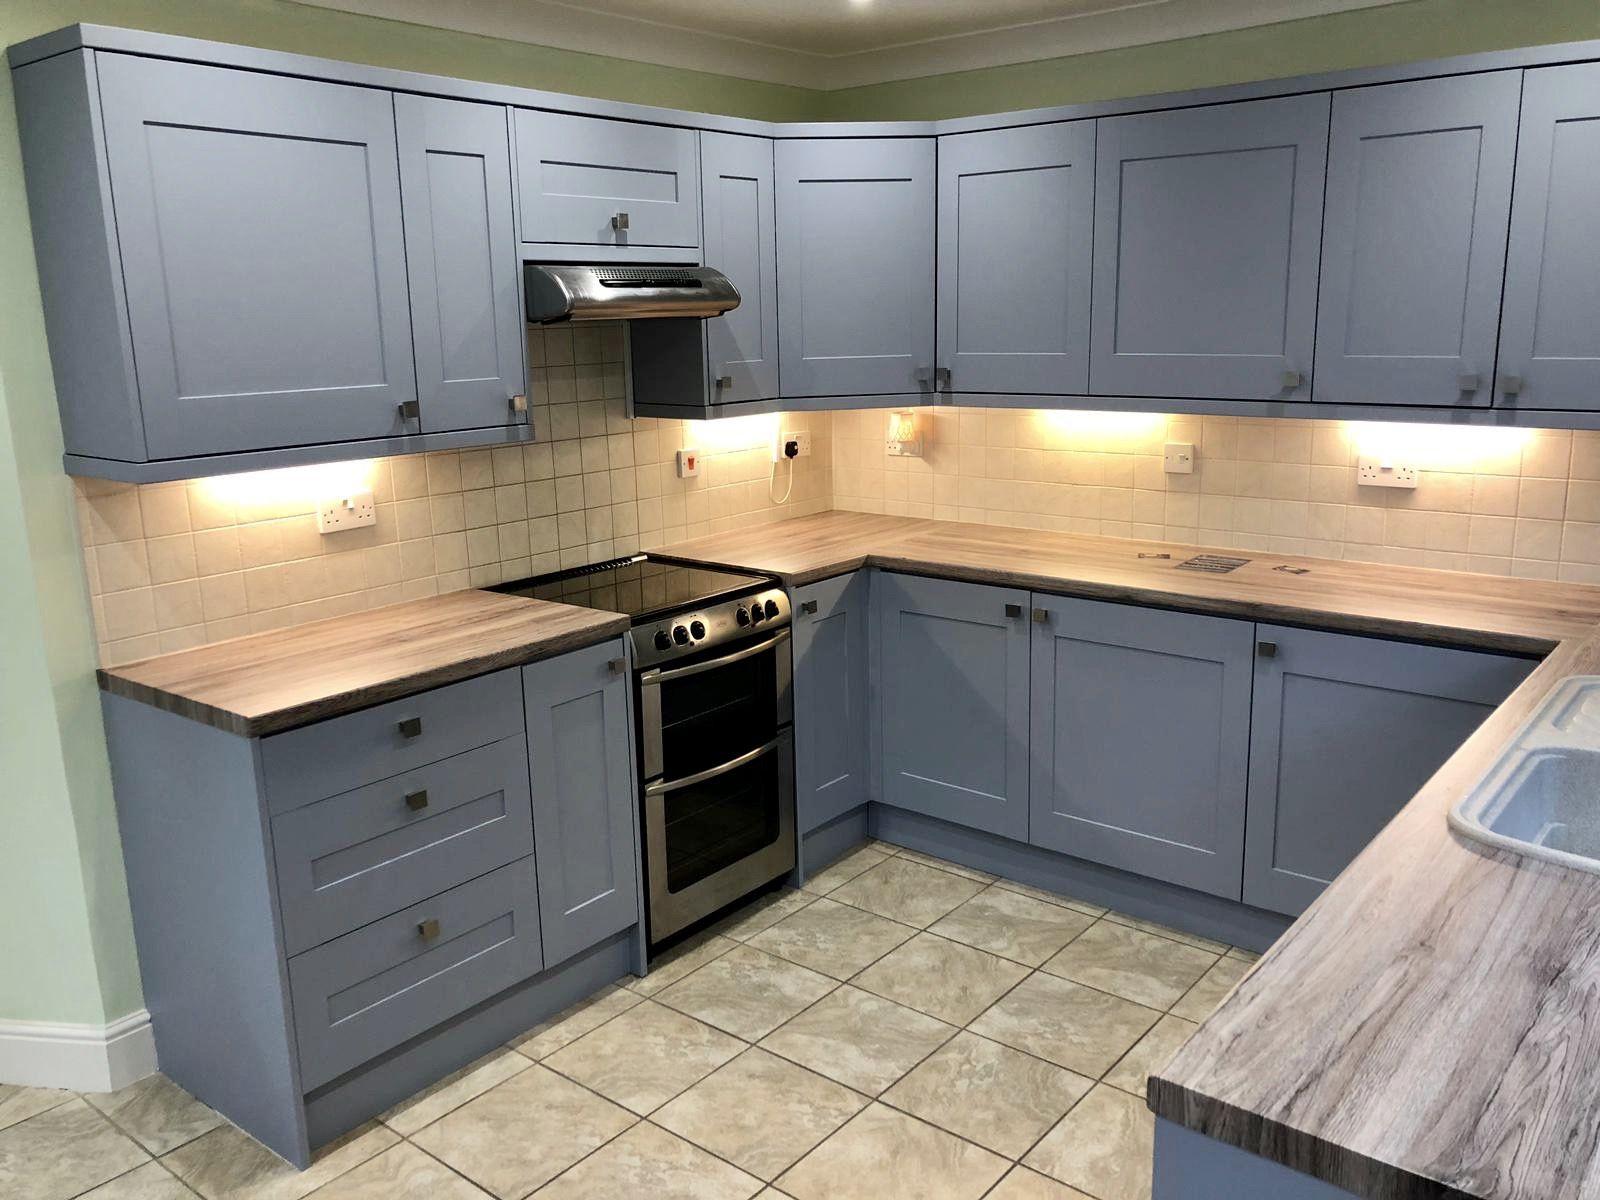 Kitchen Refurbishment In 2020 Kitchen Refurbishment Vinyl Wrap Kitchen Kitchen Wrap